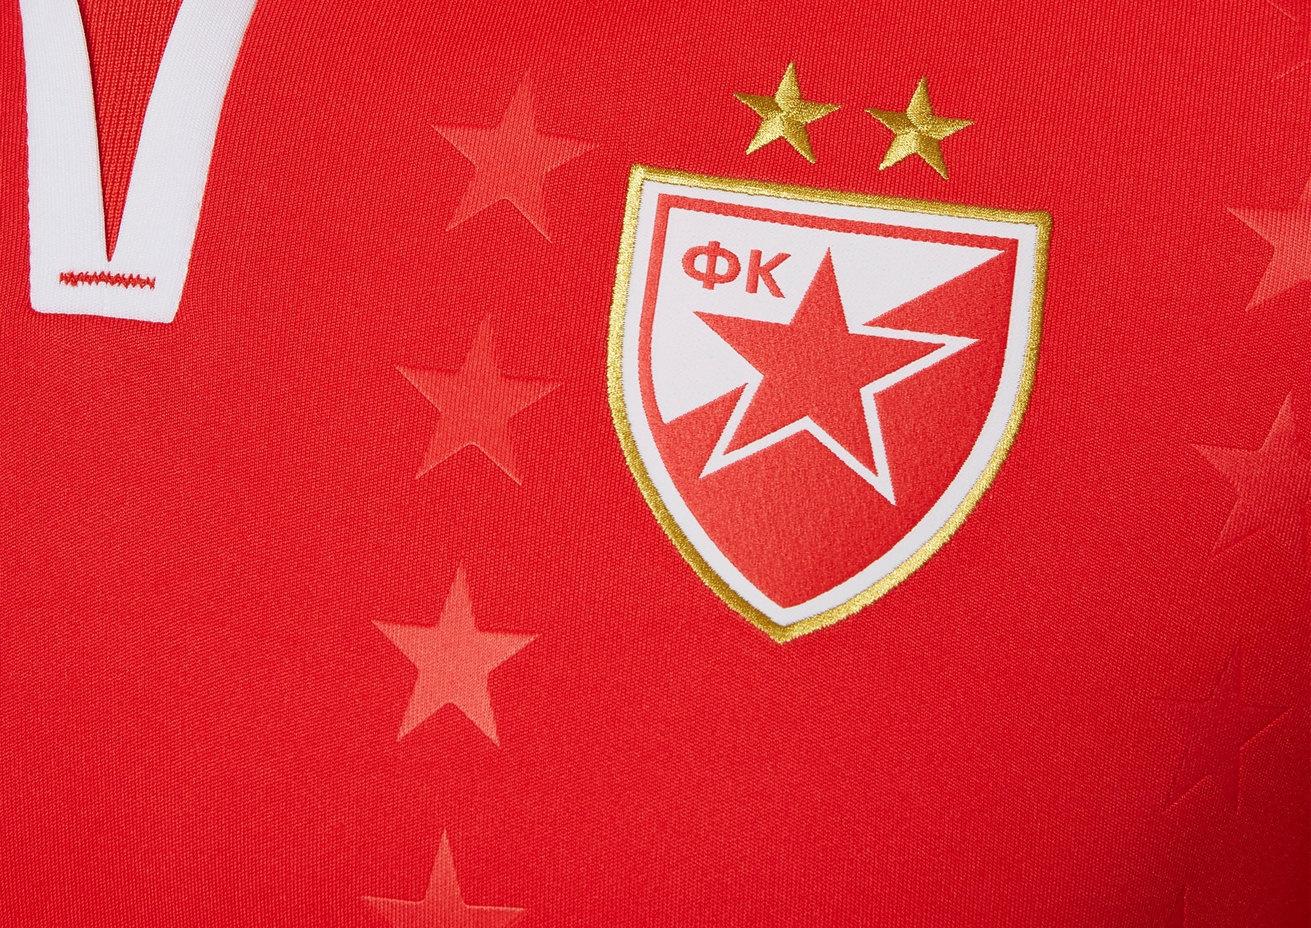 Tercera camiseta 2018/19 del Estrella Roja de Belgrado | Imagen Web Oficial